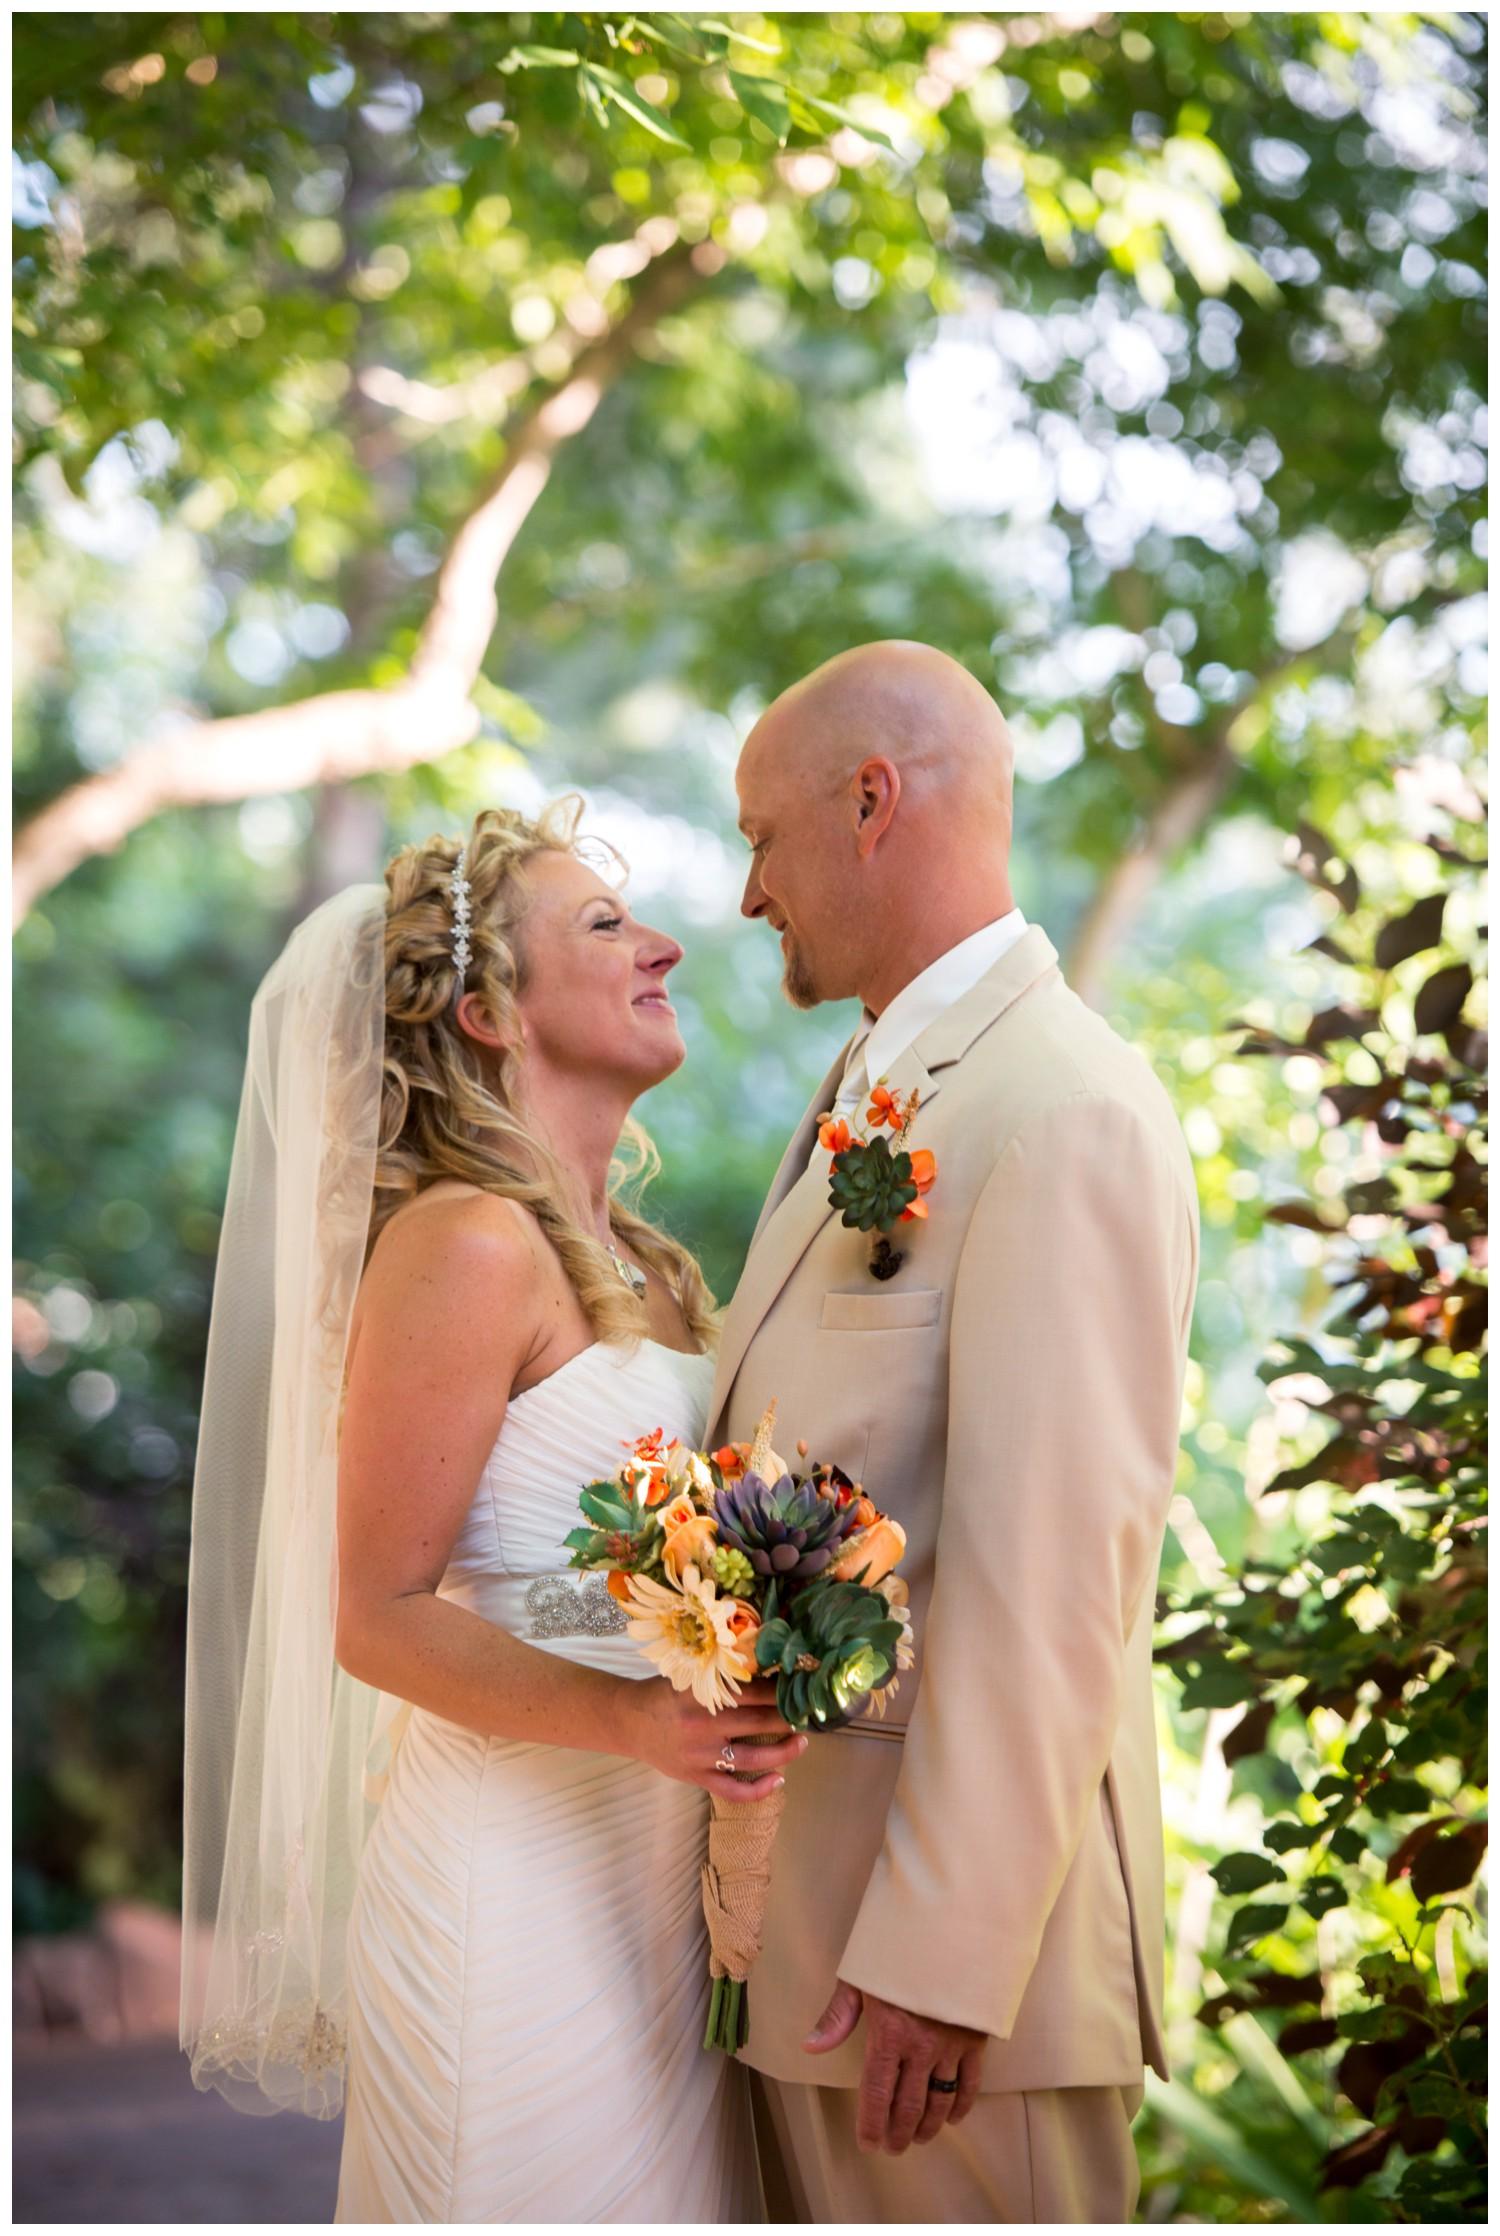 Morningside-manor-colorado-outdoor-wedding-photography_0039.jpg